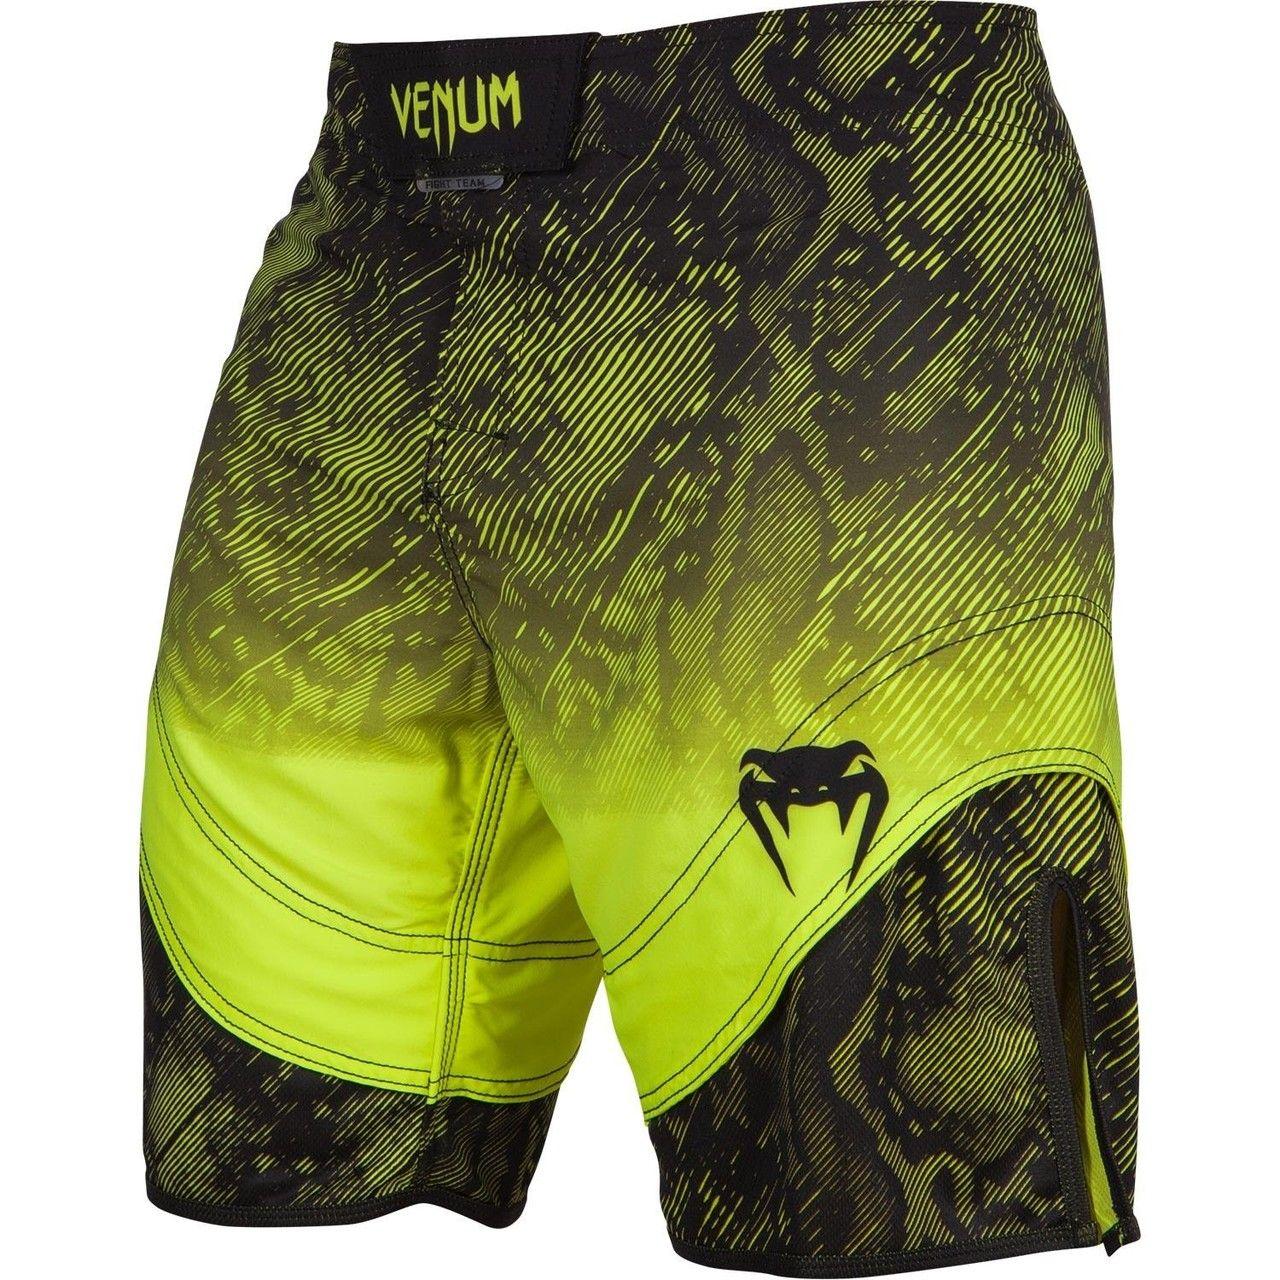 Venum Fusion Fight Shorts Black Yellow Fight Shorts Bodybuilding Clothing Training Shorts